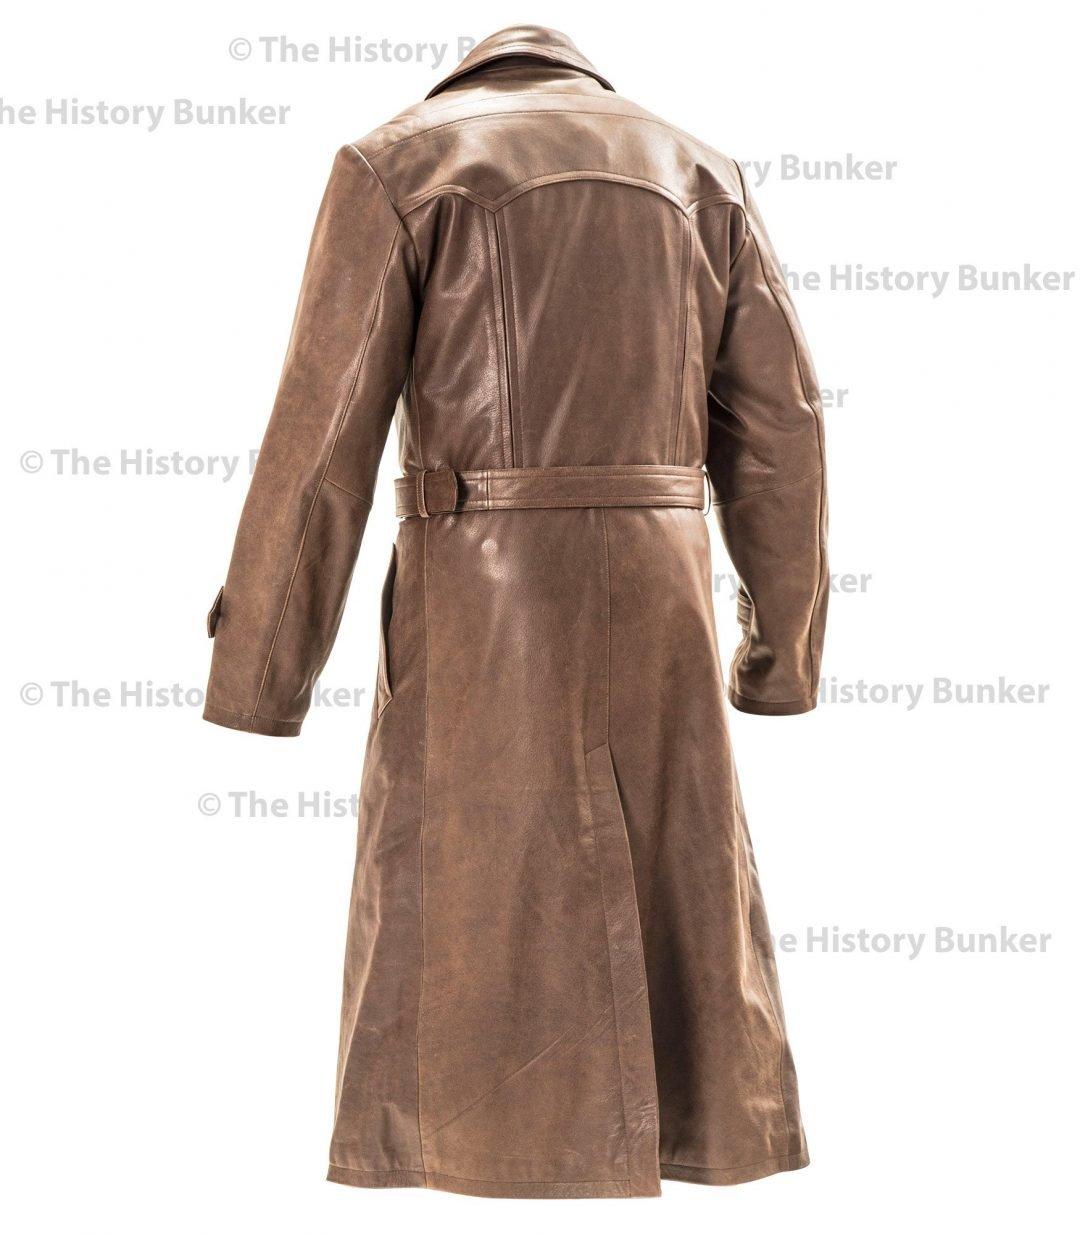 gestapo brown leather coat